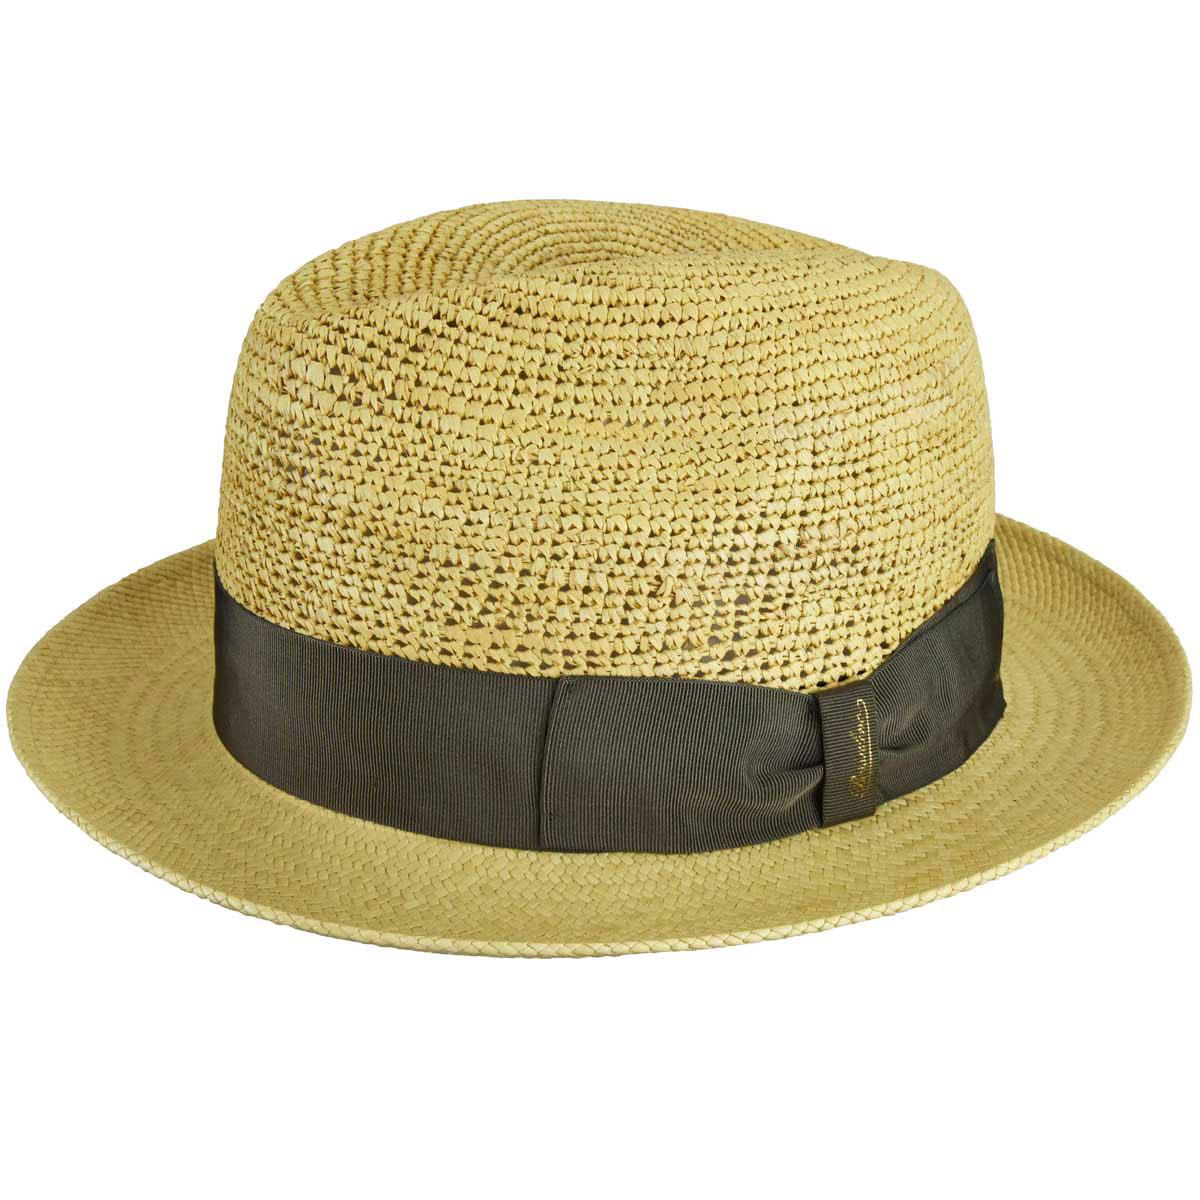 1940s Mens Hat Styles and History 141080 Panama Straw Fedora $285.00 AT vintagedancer.com